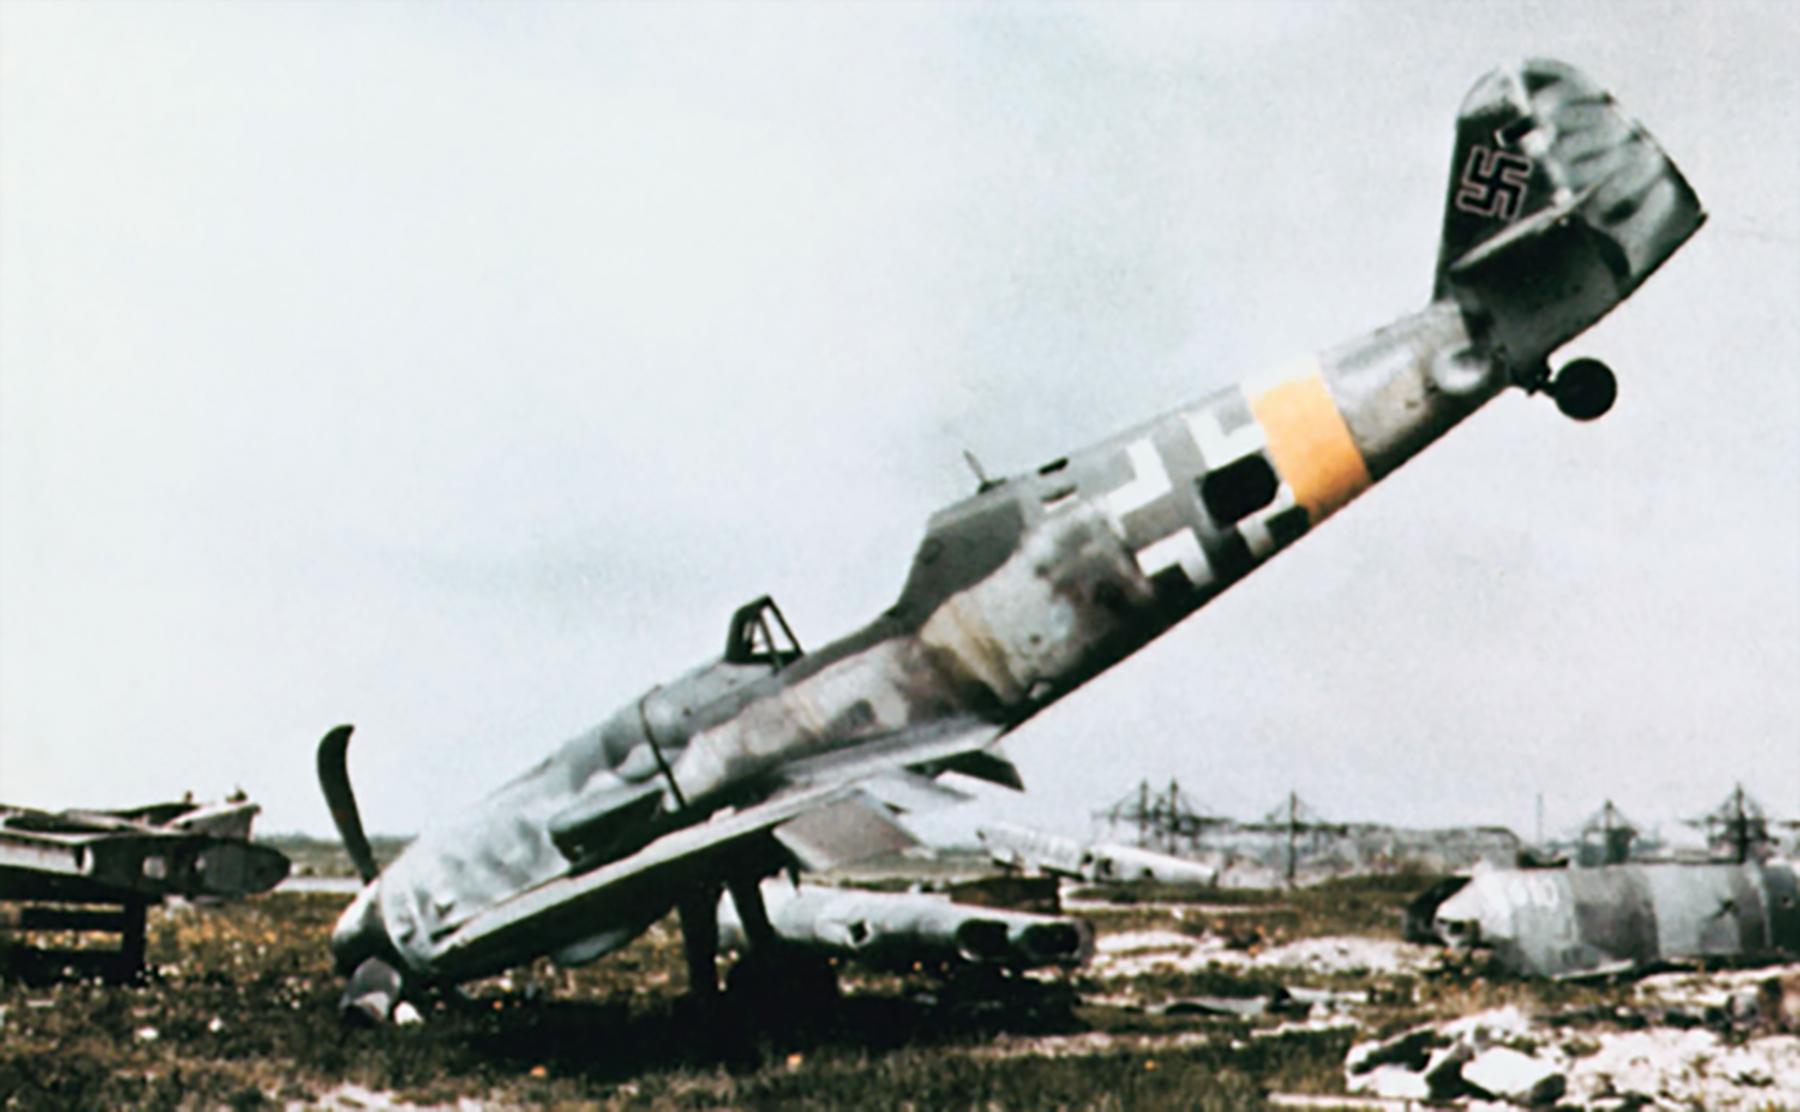 Messerschmitt Bf 109G14 Erla RVT WNr 165545 unknown unit lies abandoned Augsburg Bavaria Germany May 1945 01